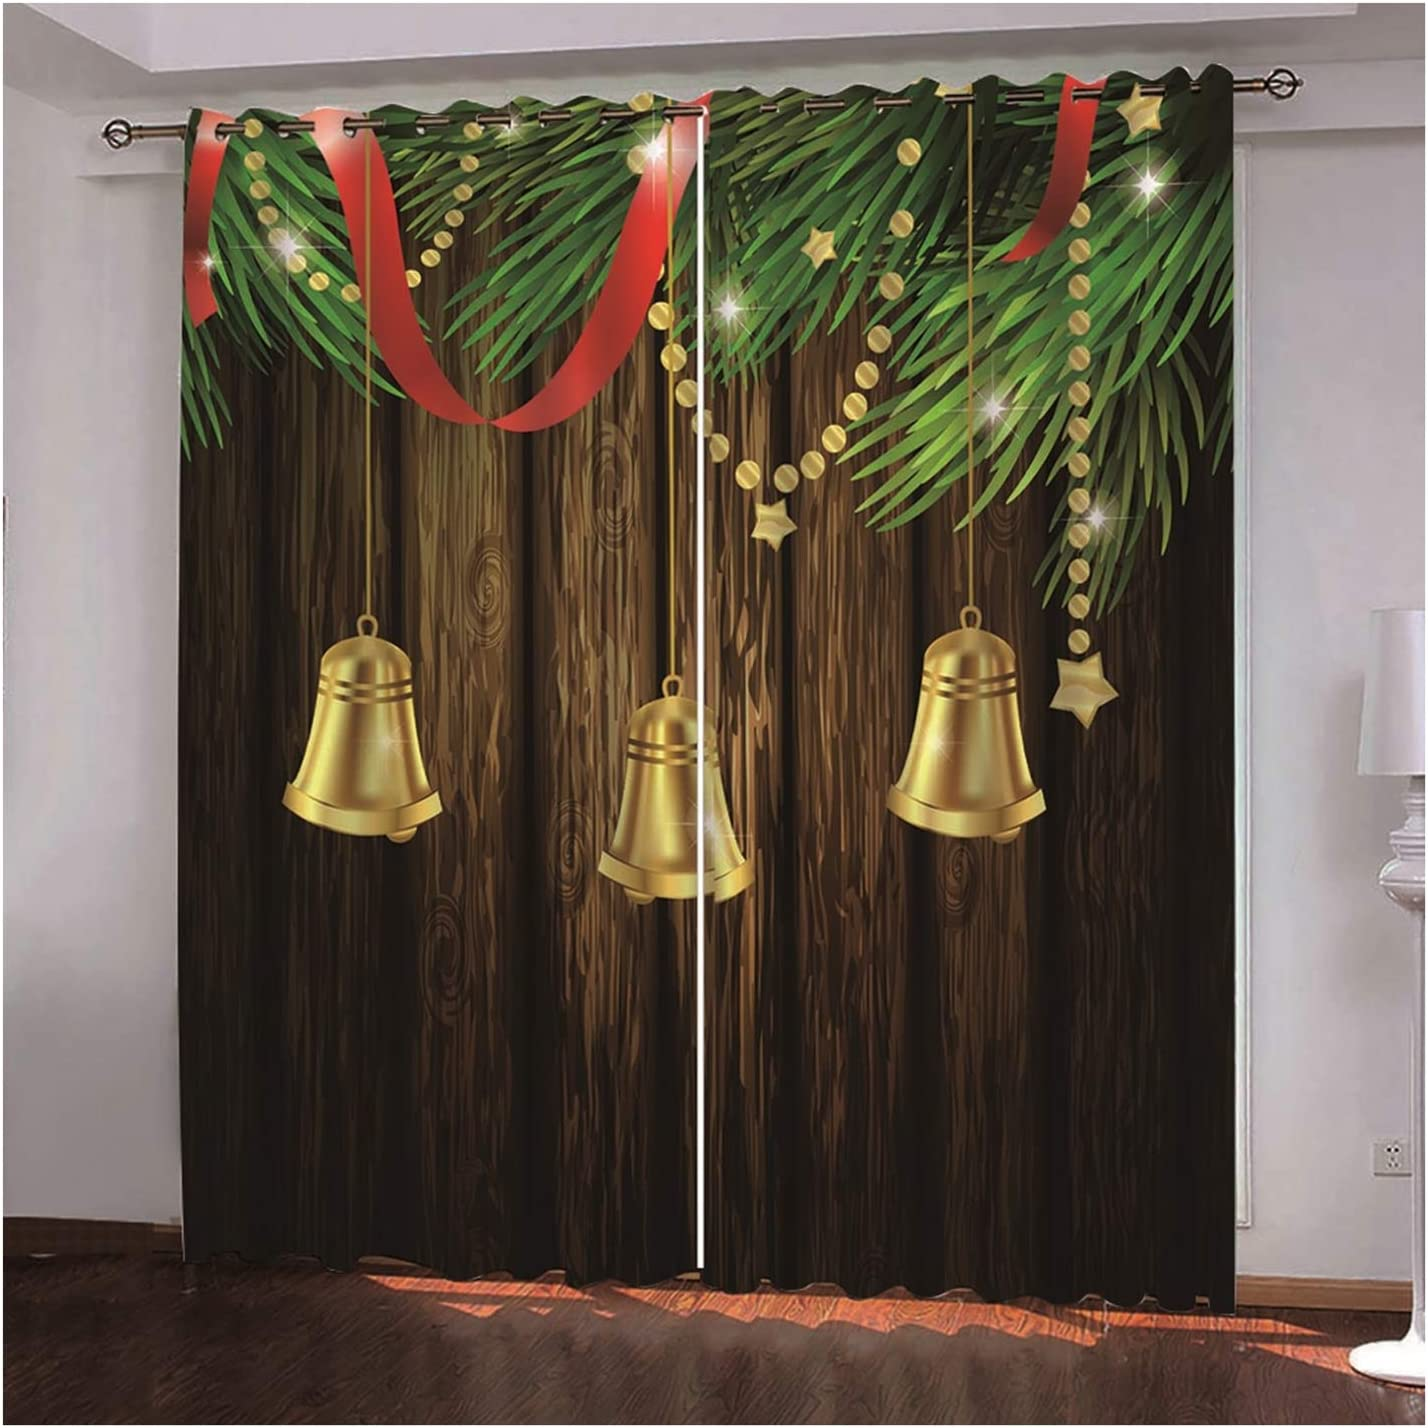 Daesar Christmas Window San Antonio Mall Ranking TOP10 Curtains Curtain for 2 Room Pane Living